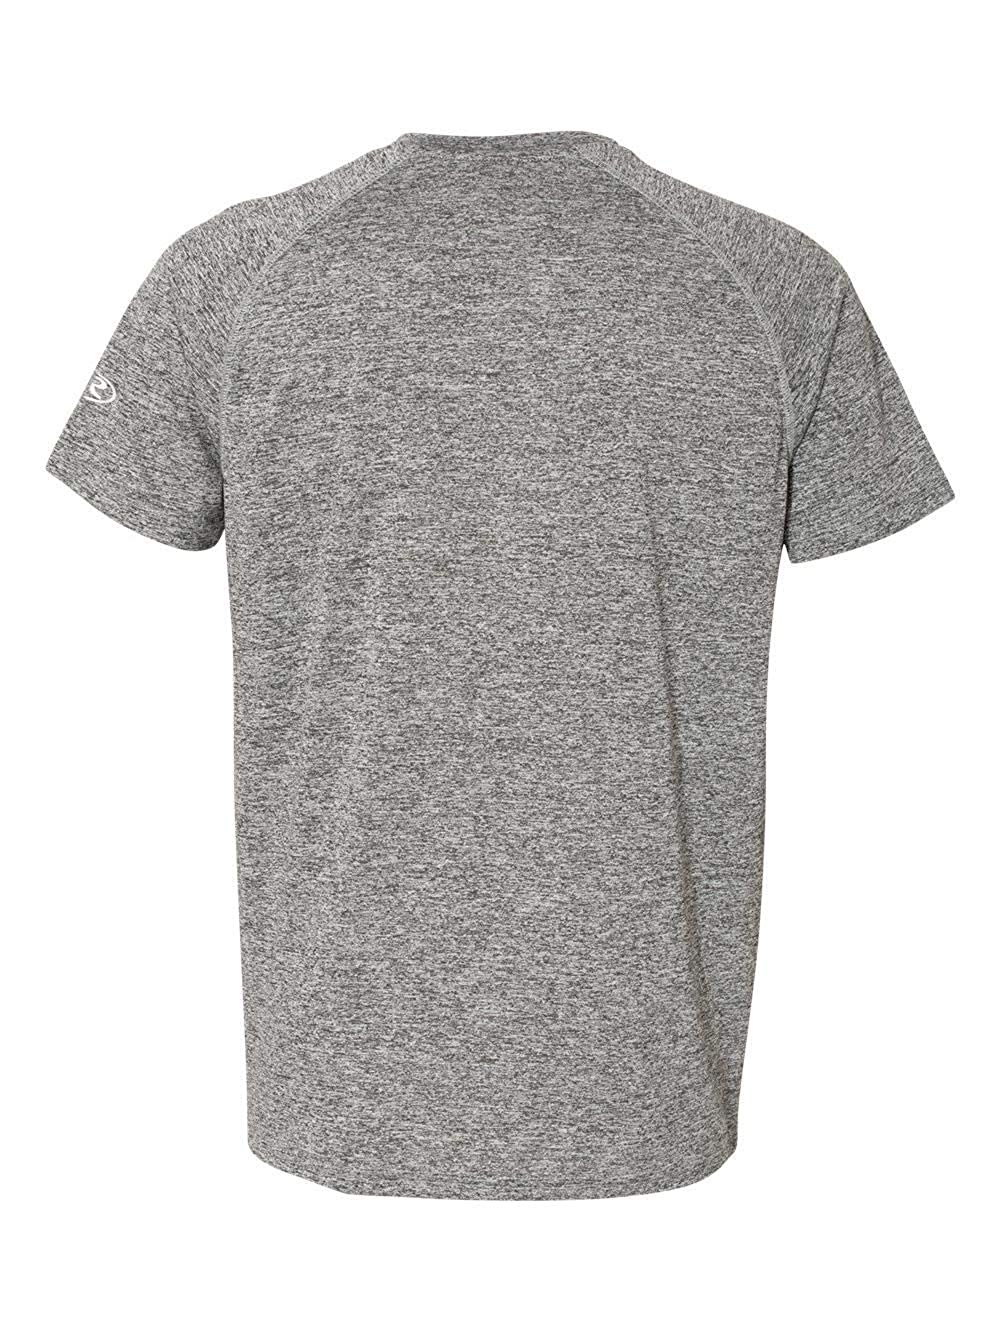 Rawlings 8101 Performance Cationic Insert Short Sleeve T-Shirt Heather Grey L